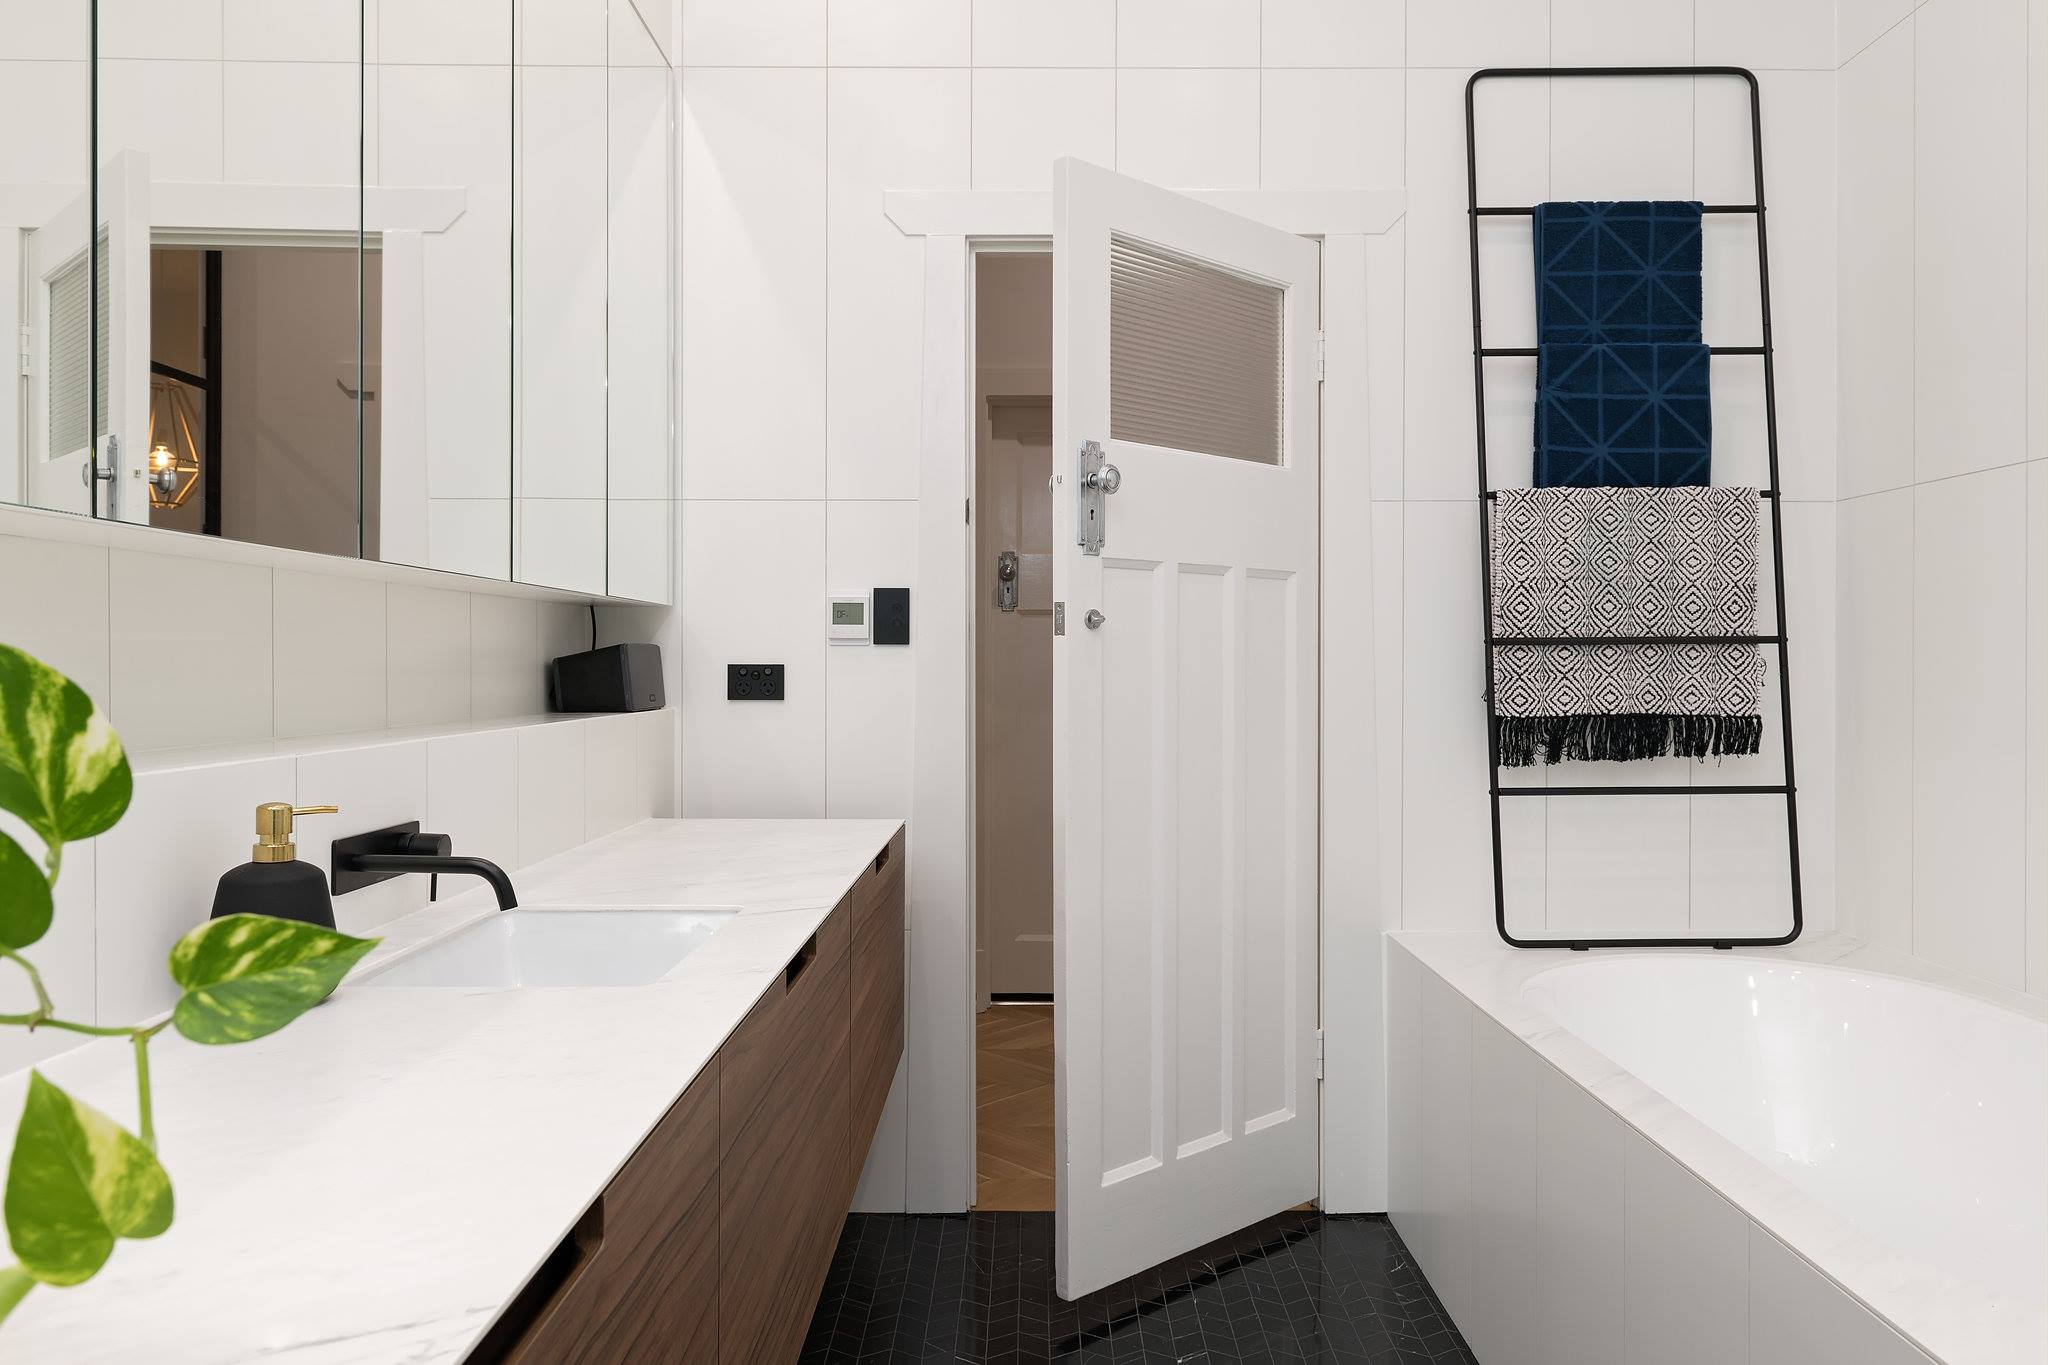 wall - WHITE MATT RECTIFIED (NH9306) 6PCBOX (300x900) & floor - non stock item - Skheme Tiles (1).jpg